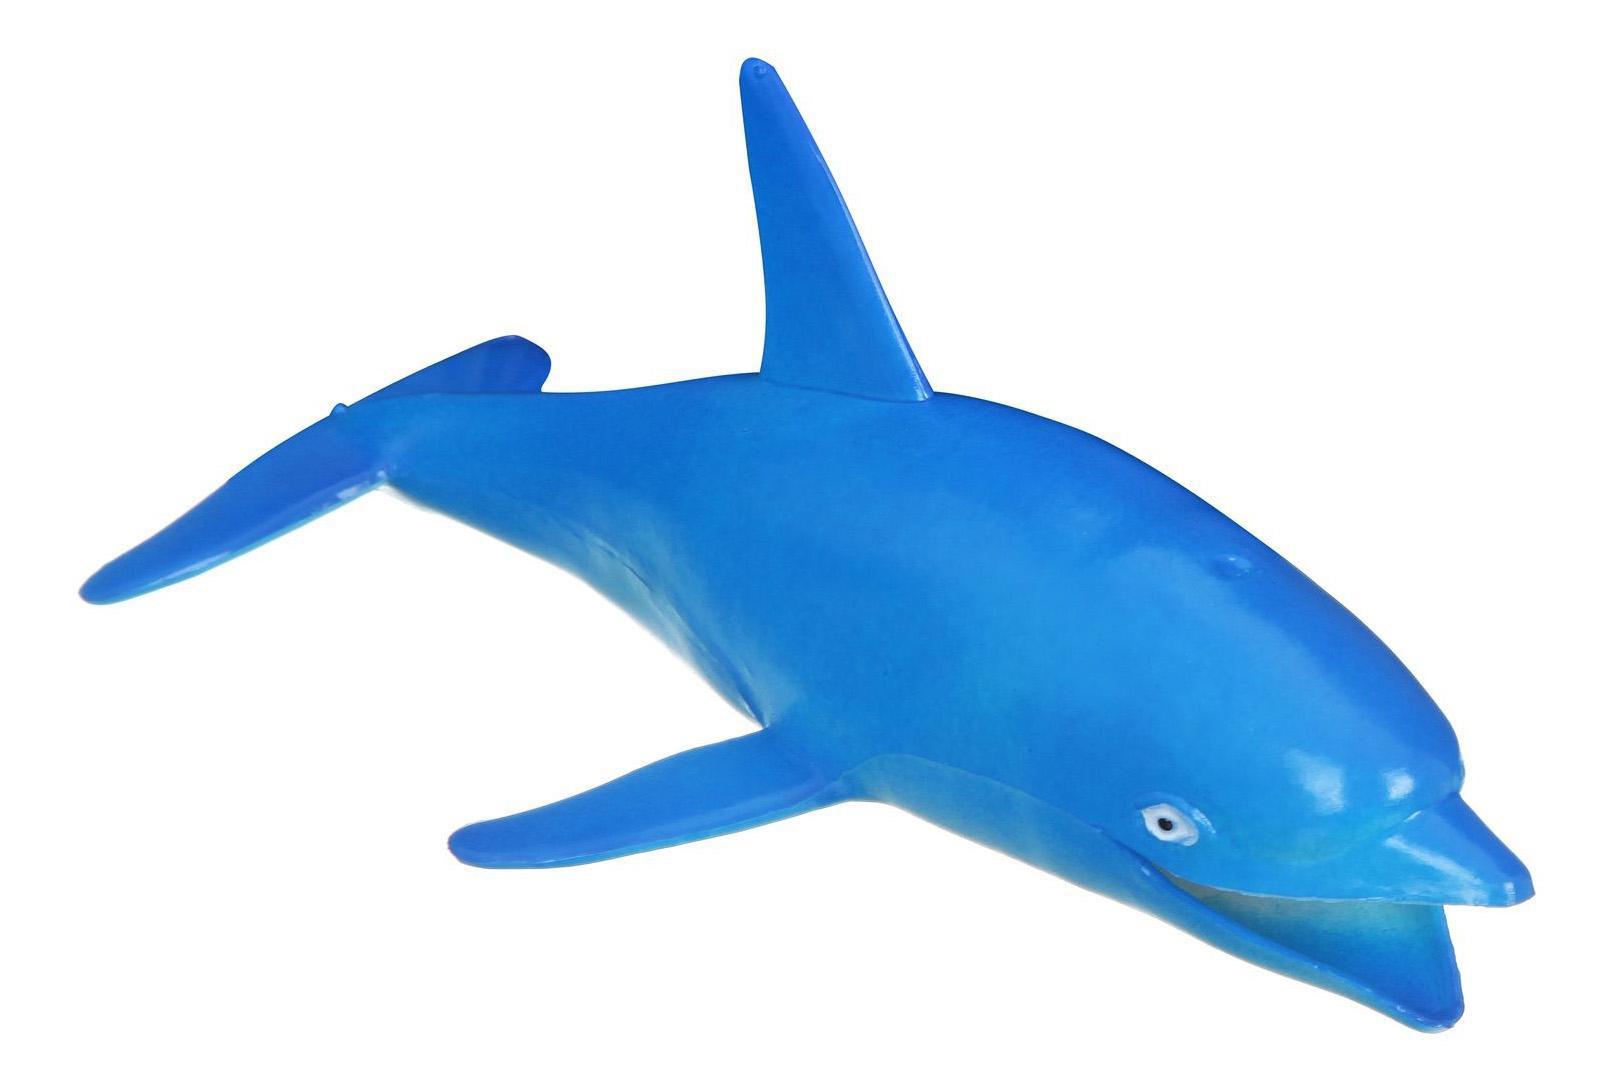 Набор животных Bondibon ребятам о зверятах, дельфины, 8